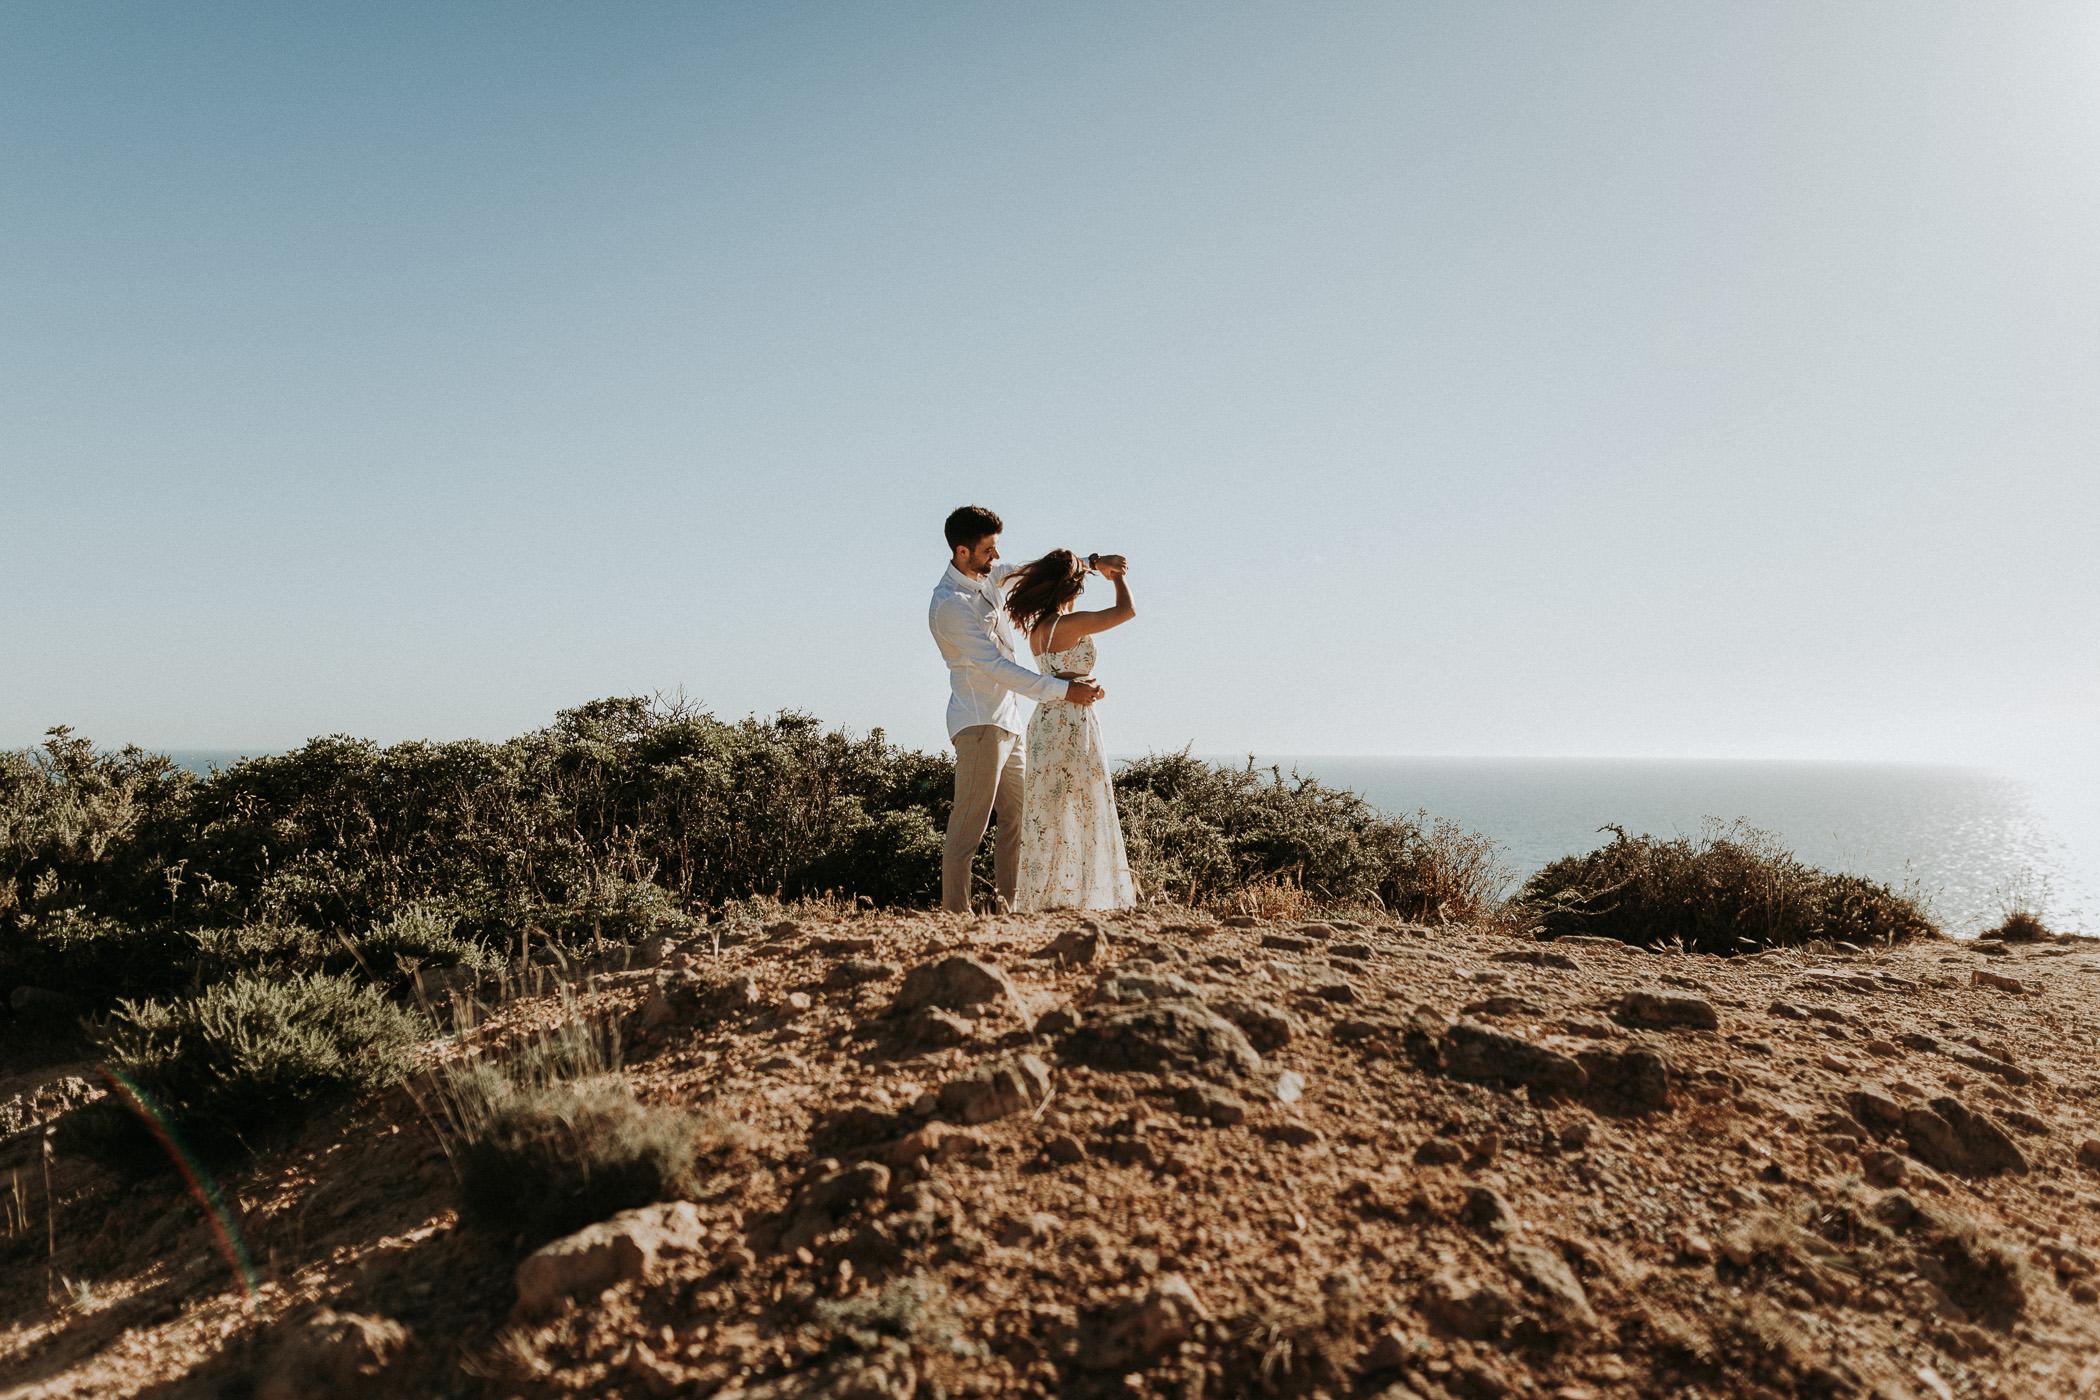 DanielaMarquardtPhotography_wedding_elopement_mallorca_spain_calapi_palma_lauraandtoni_142